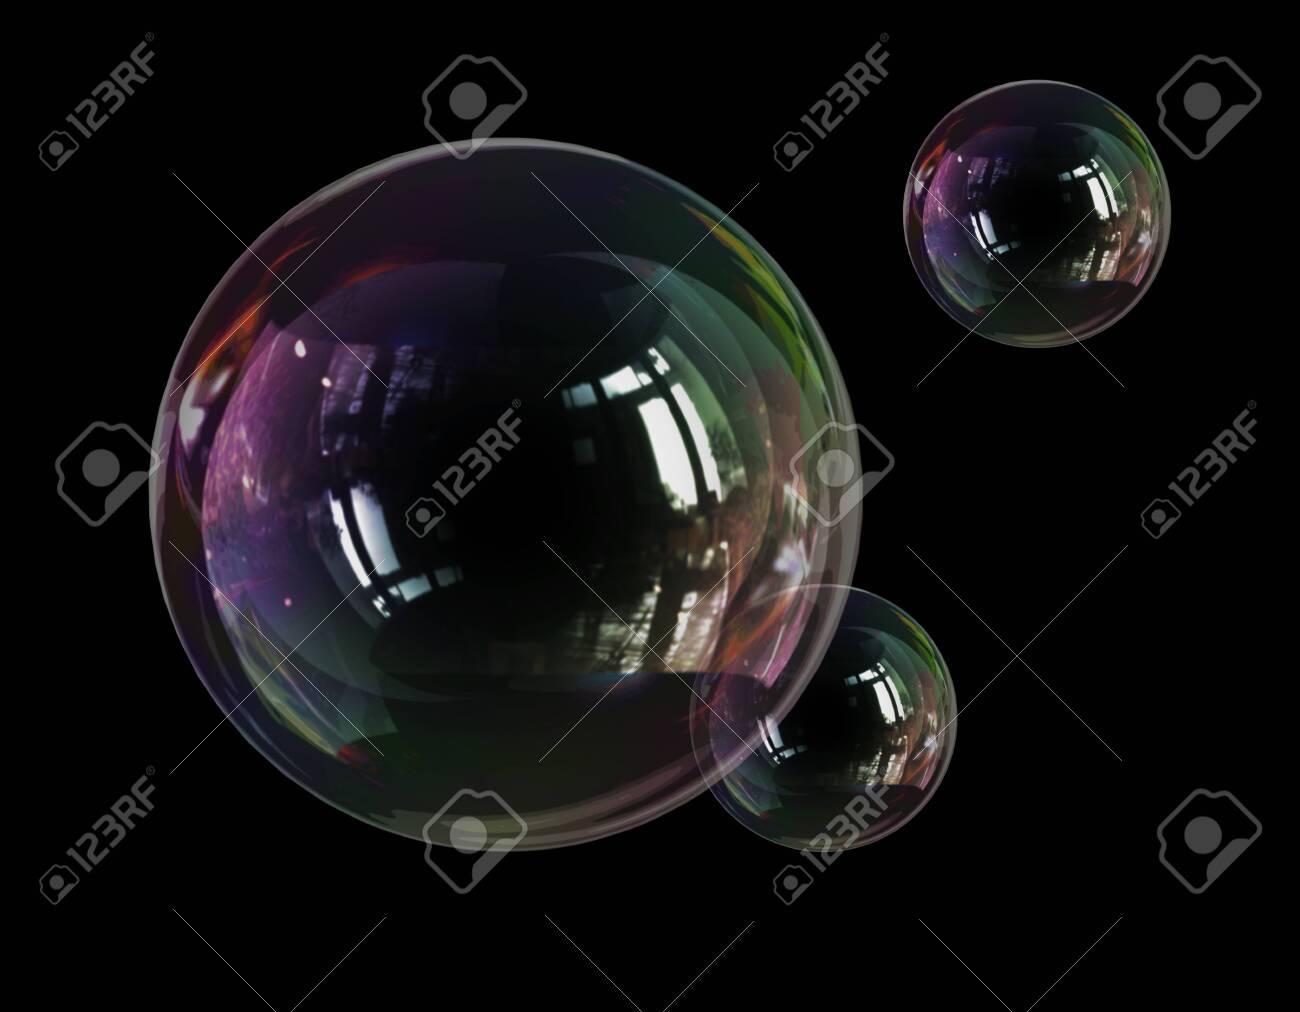 soap bubble lightness fragility - 133168878